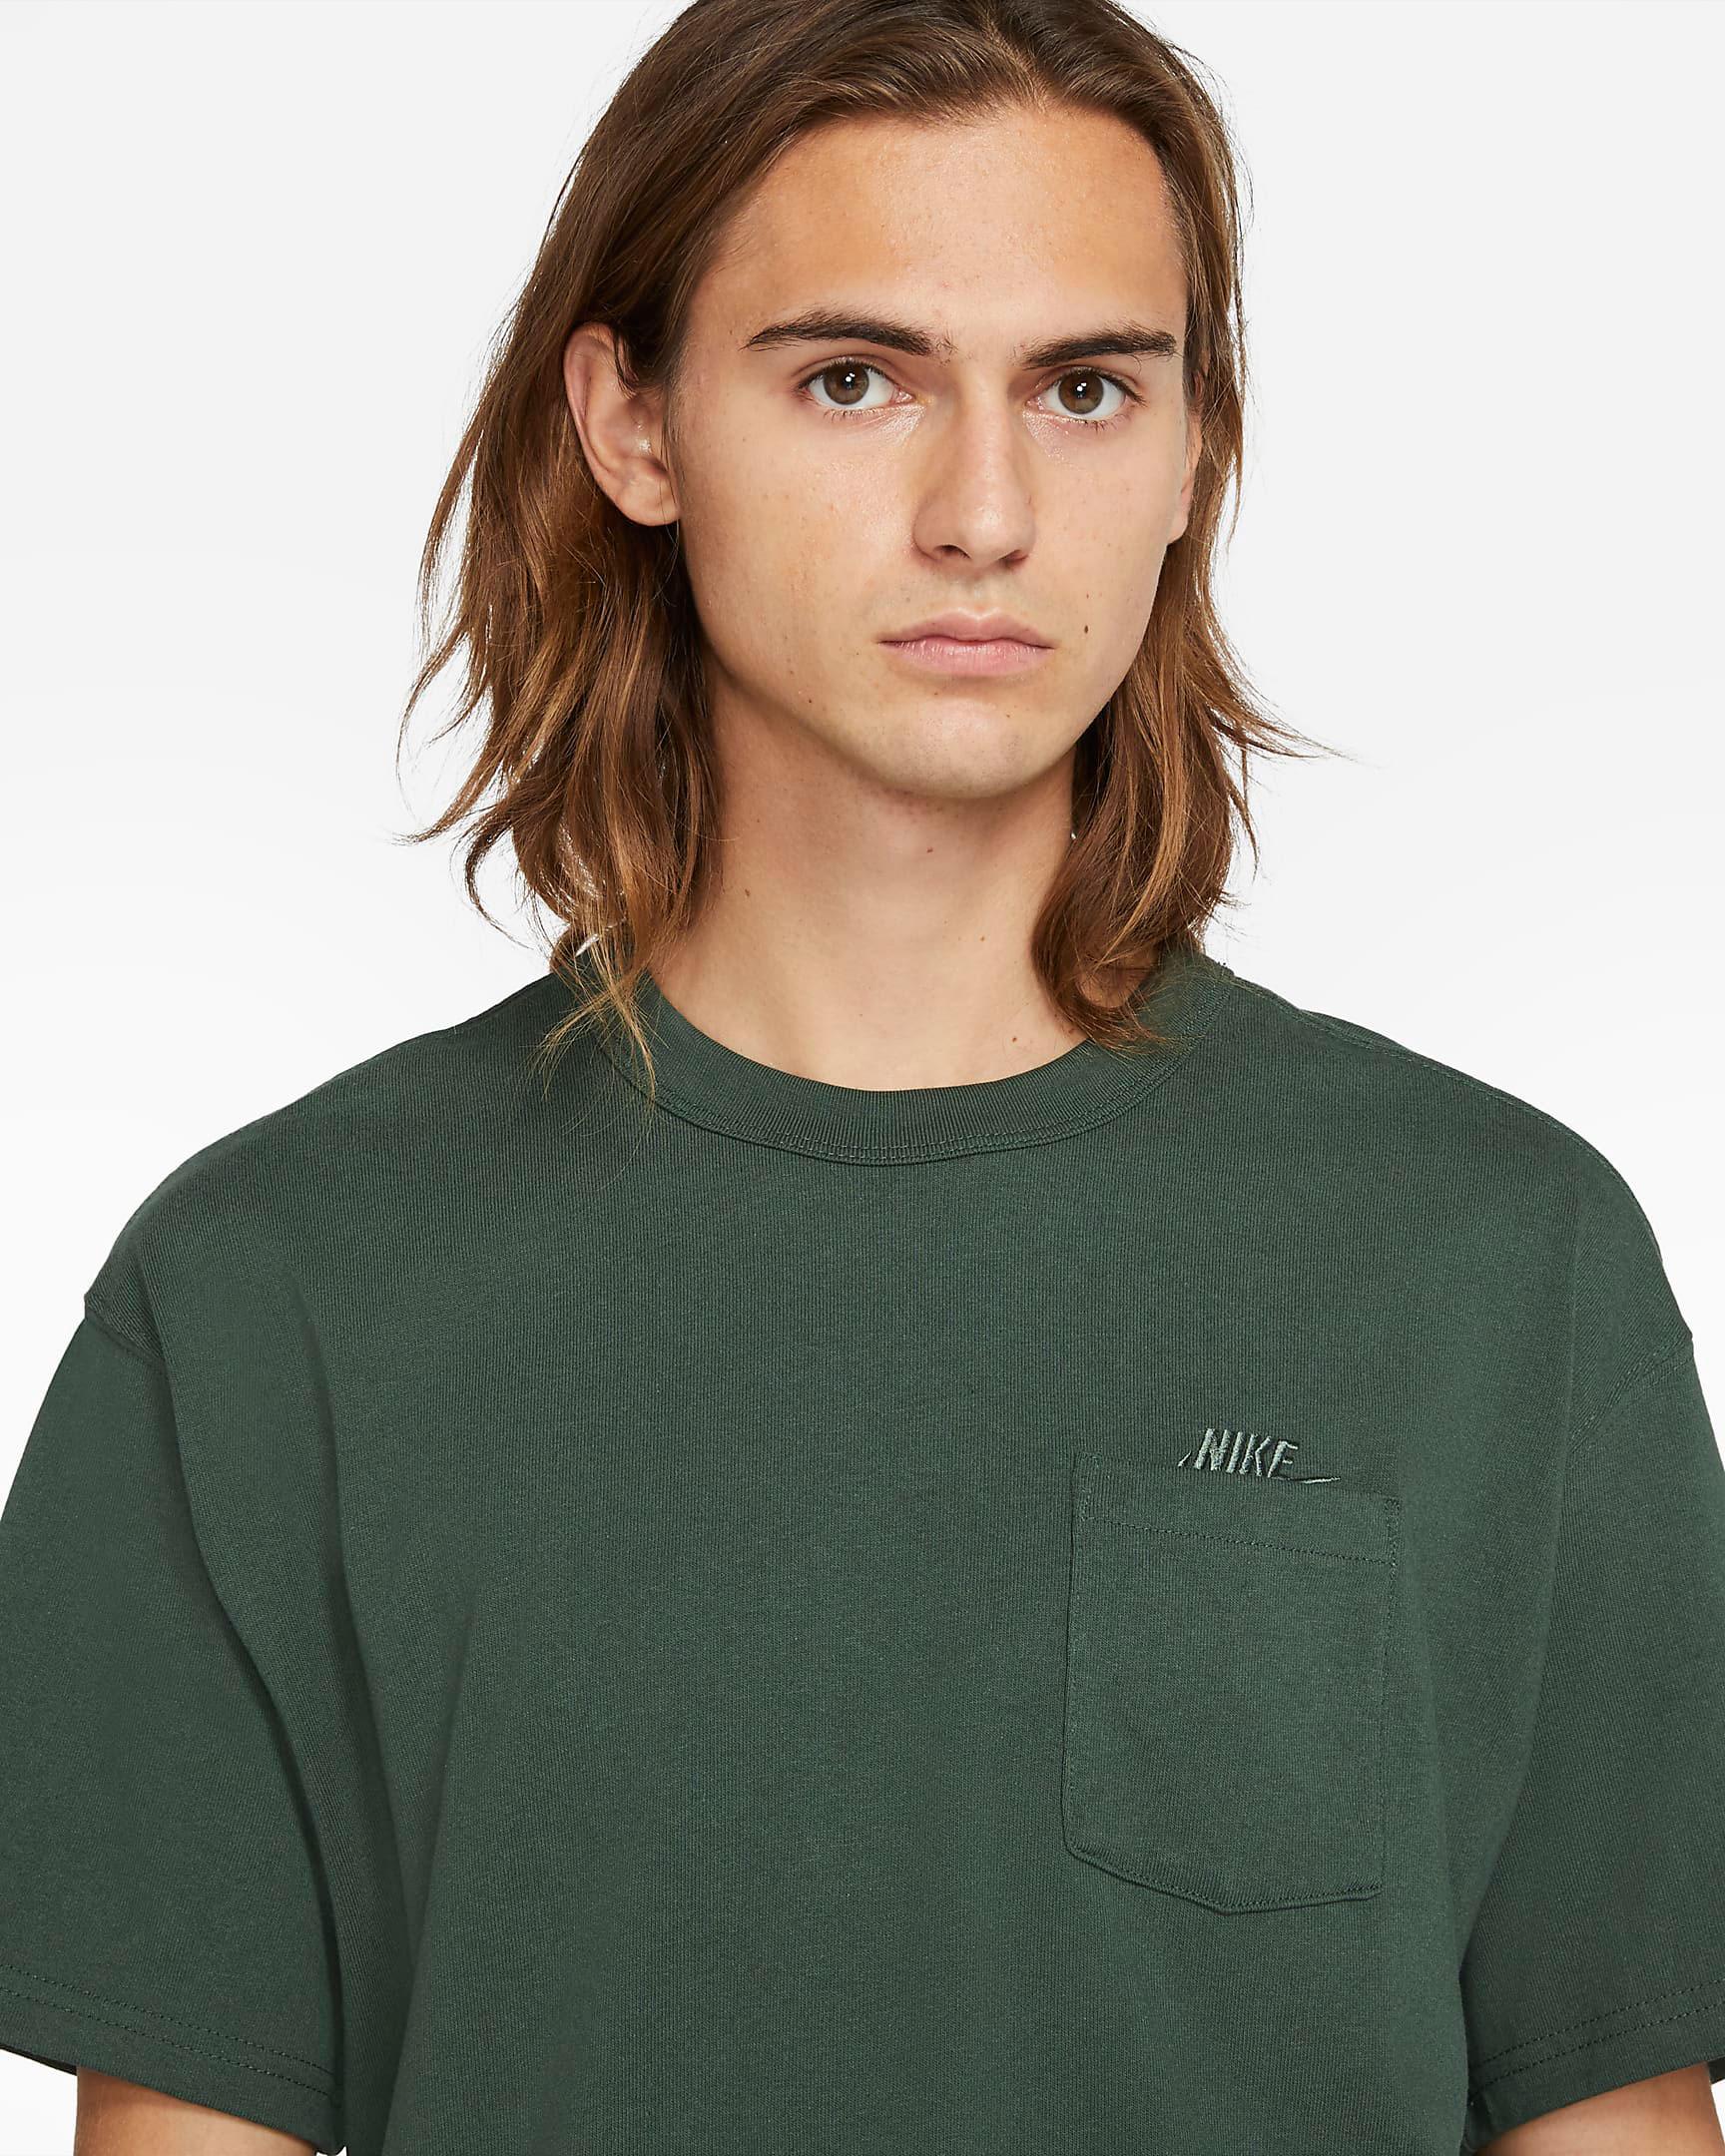 nike-galactic-jade-pocket-t-shirt-2